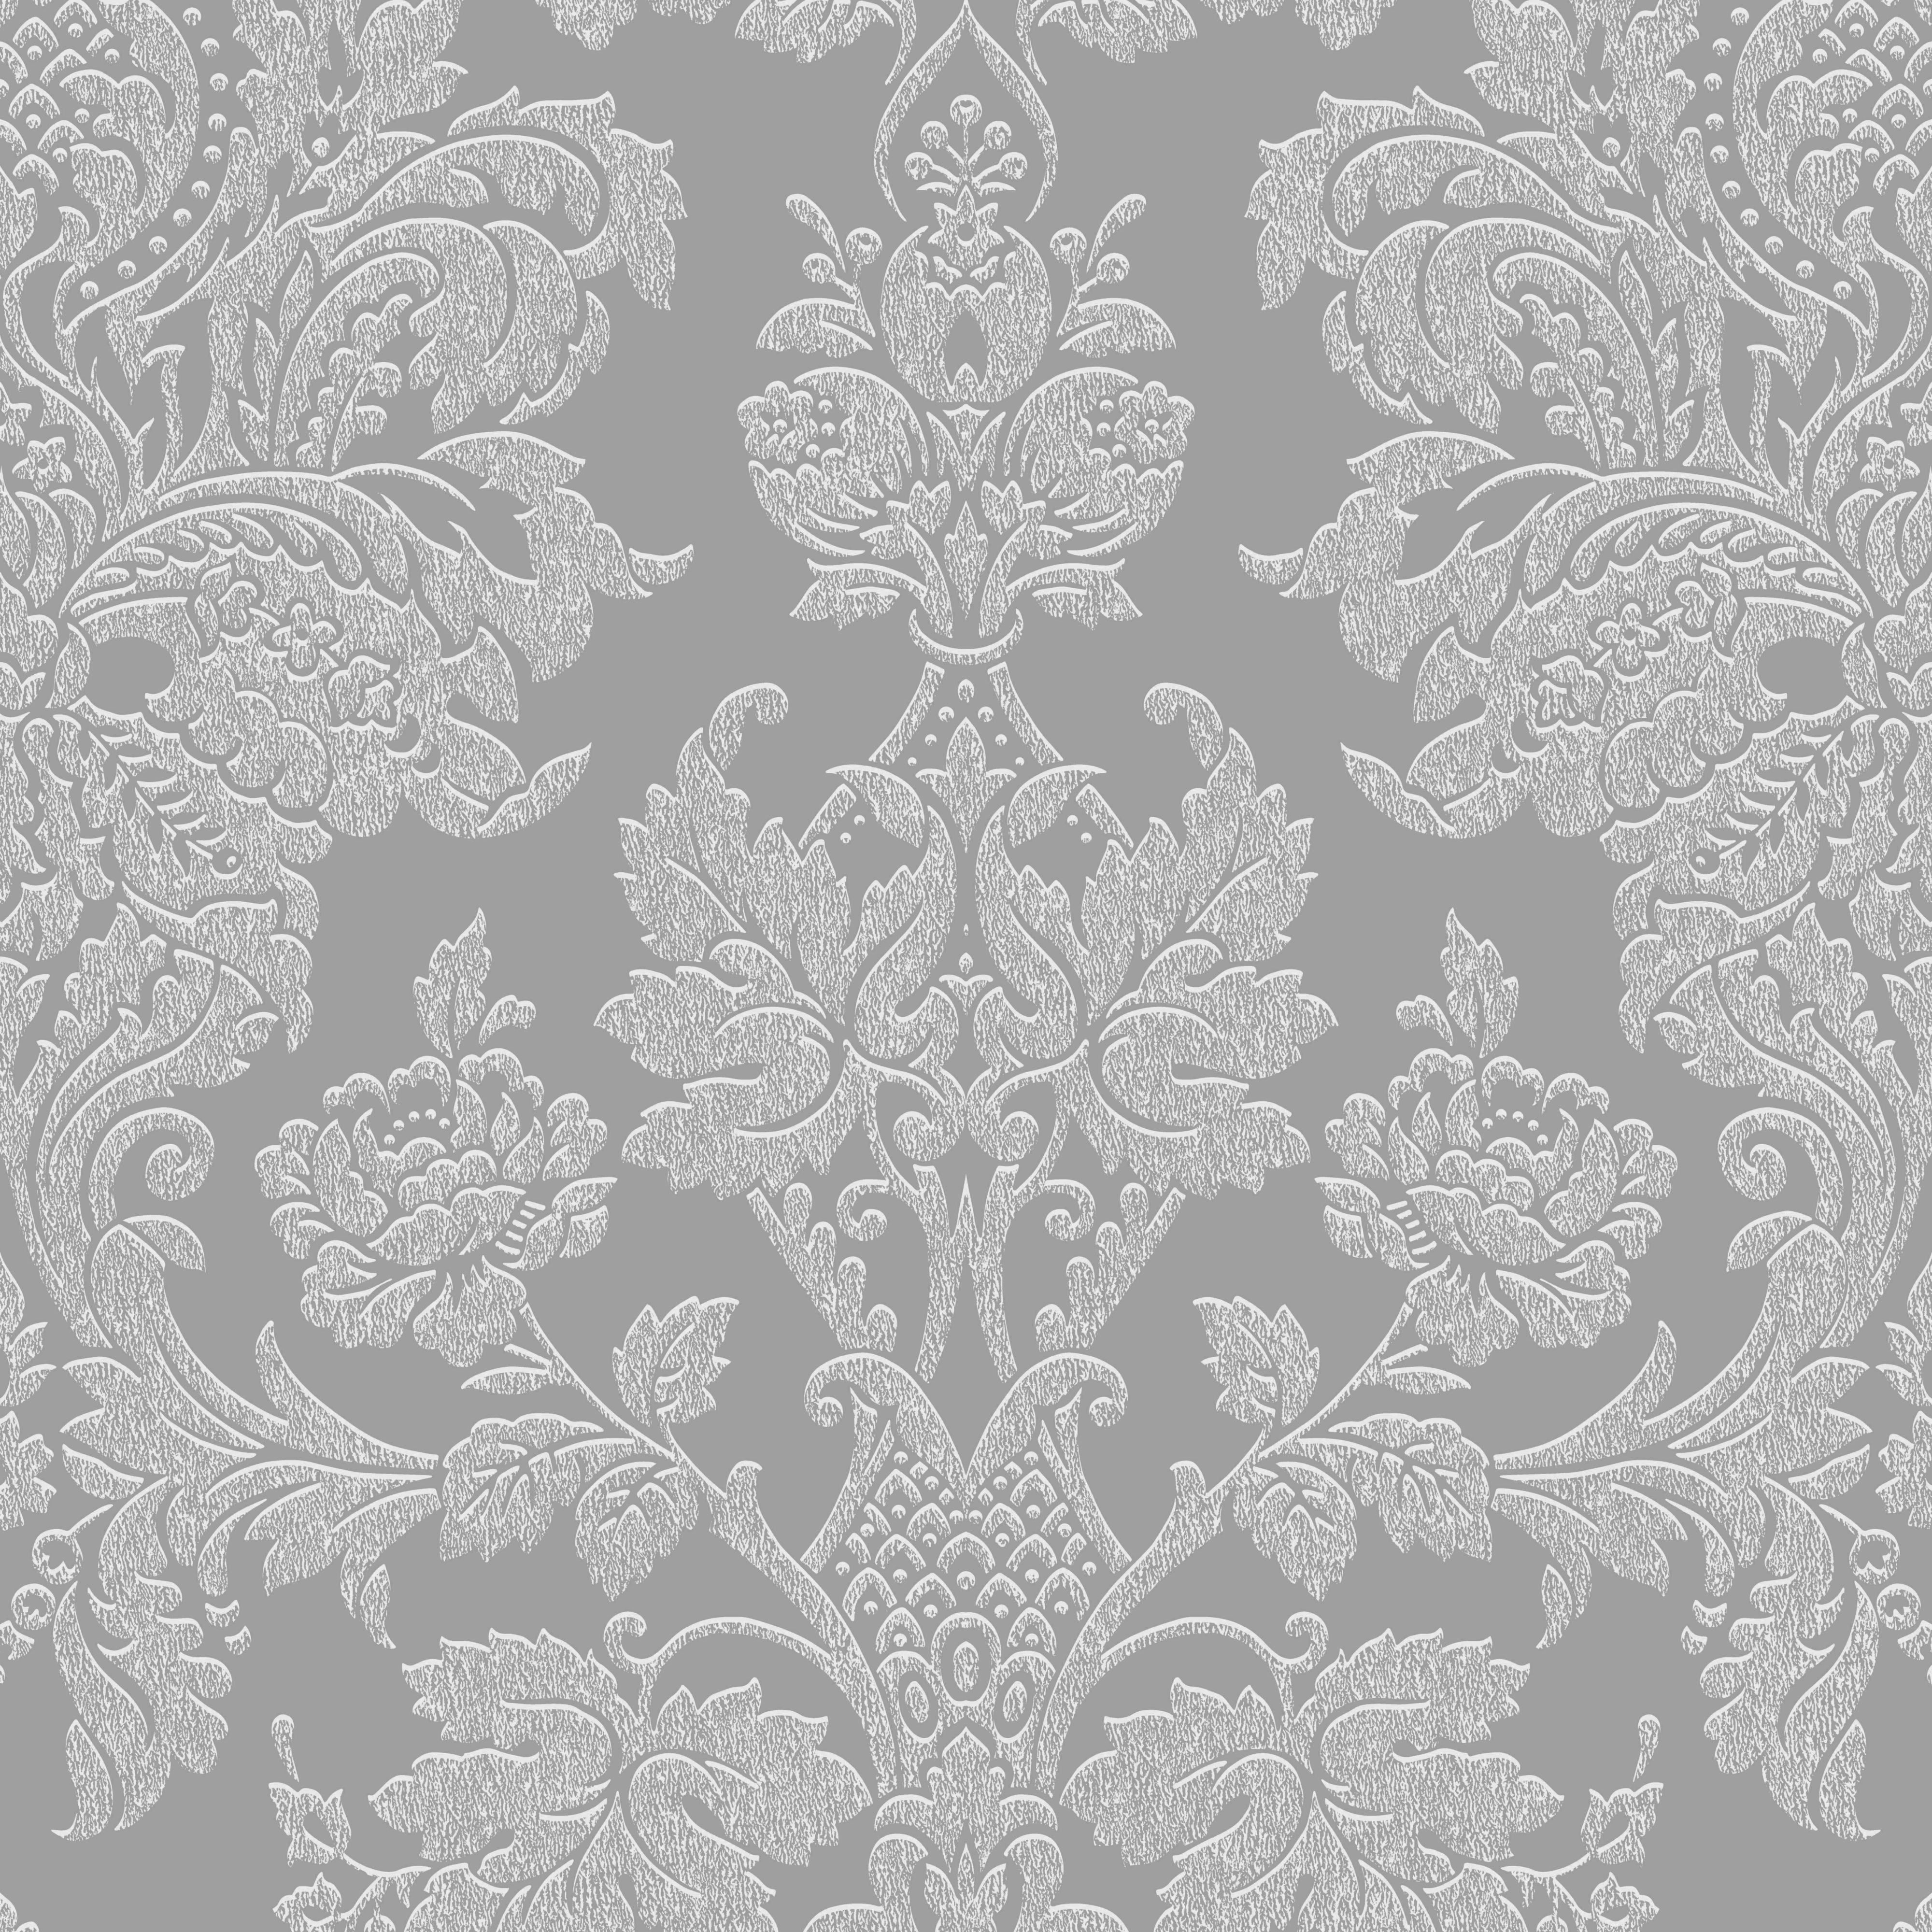 Buckingham Silver Damask Metallic Wallpaper   Departments   DIY at B Q. Graham   Brown Fibrous Buckingham Silver Damask Metallic Wallpaper